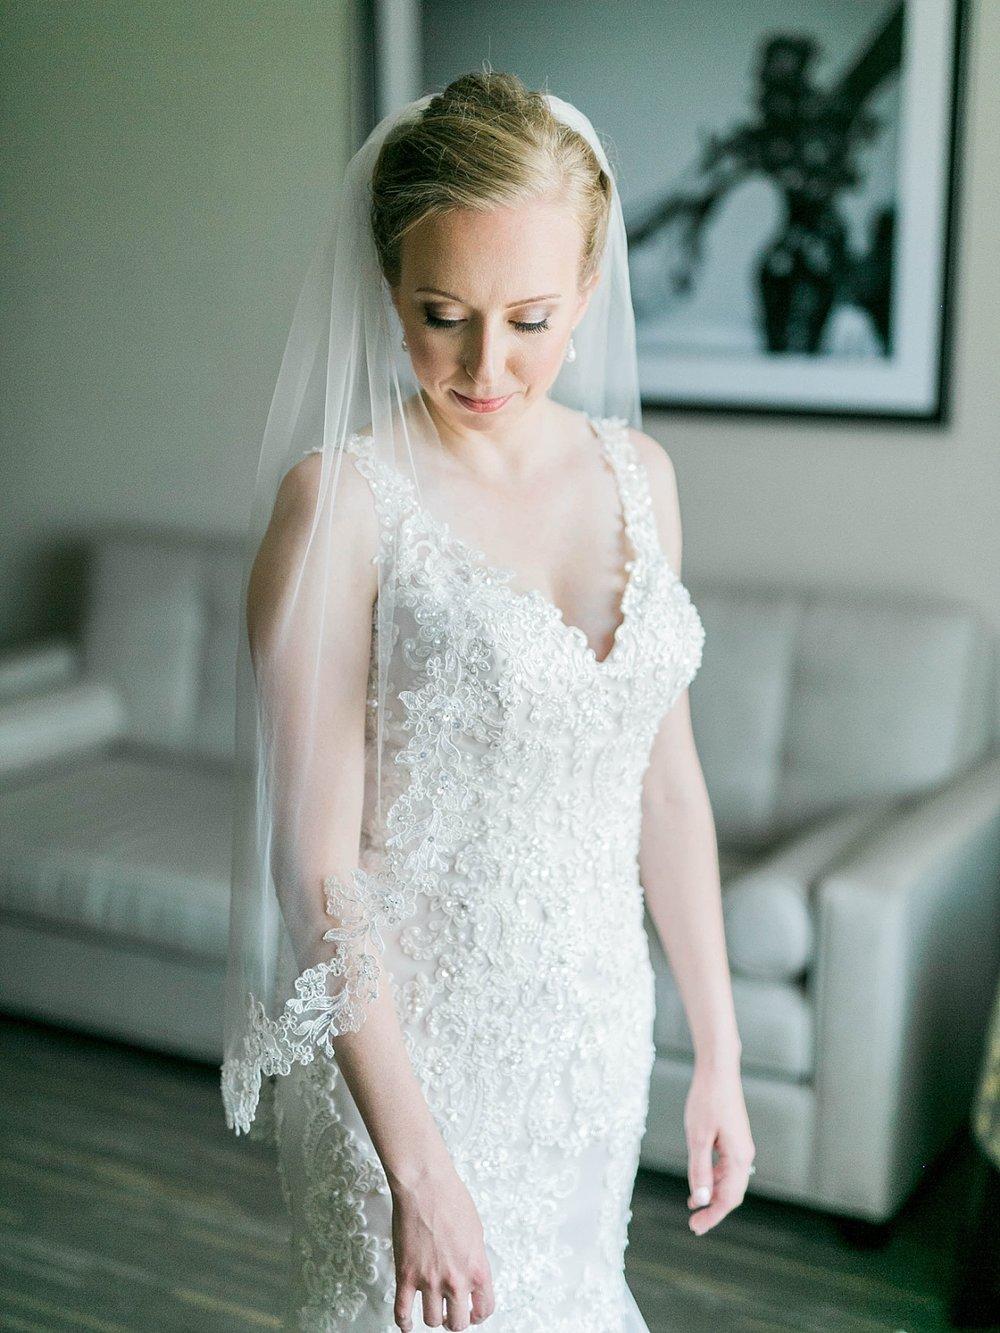 Storybook ending wedding dress moline, il